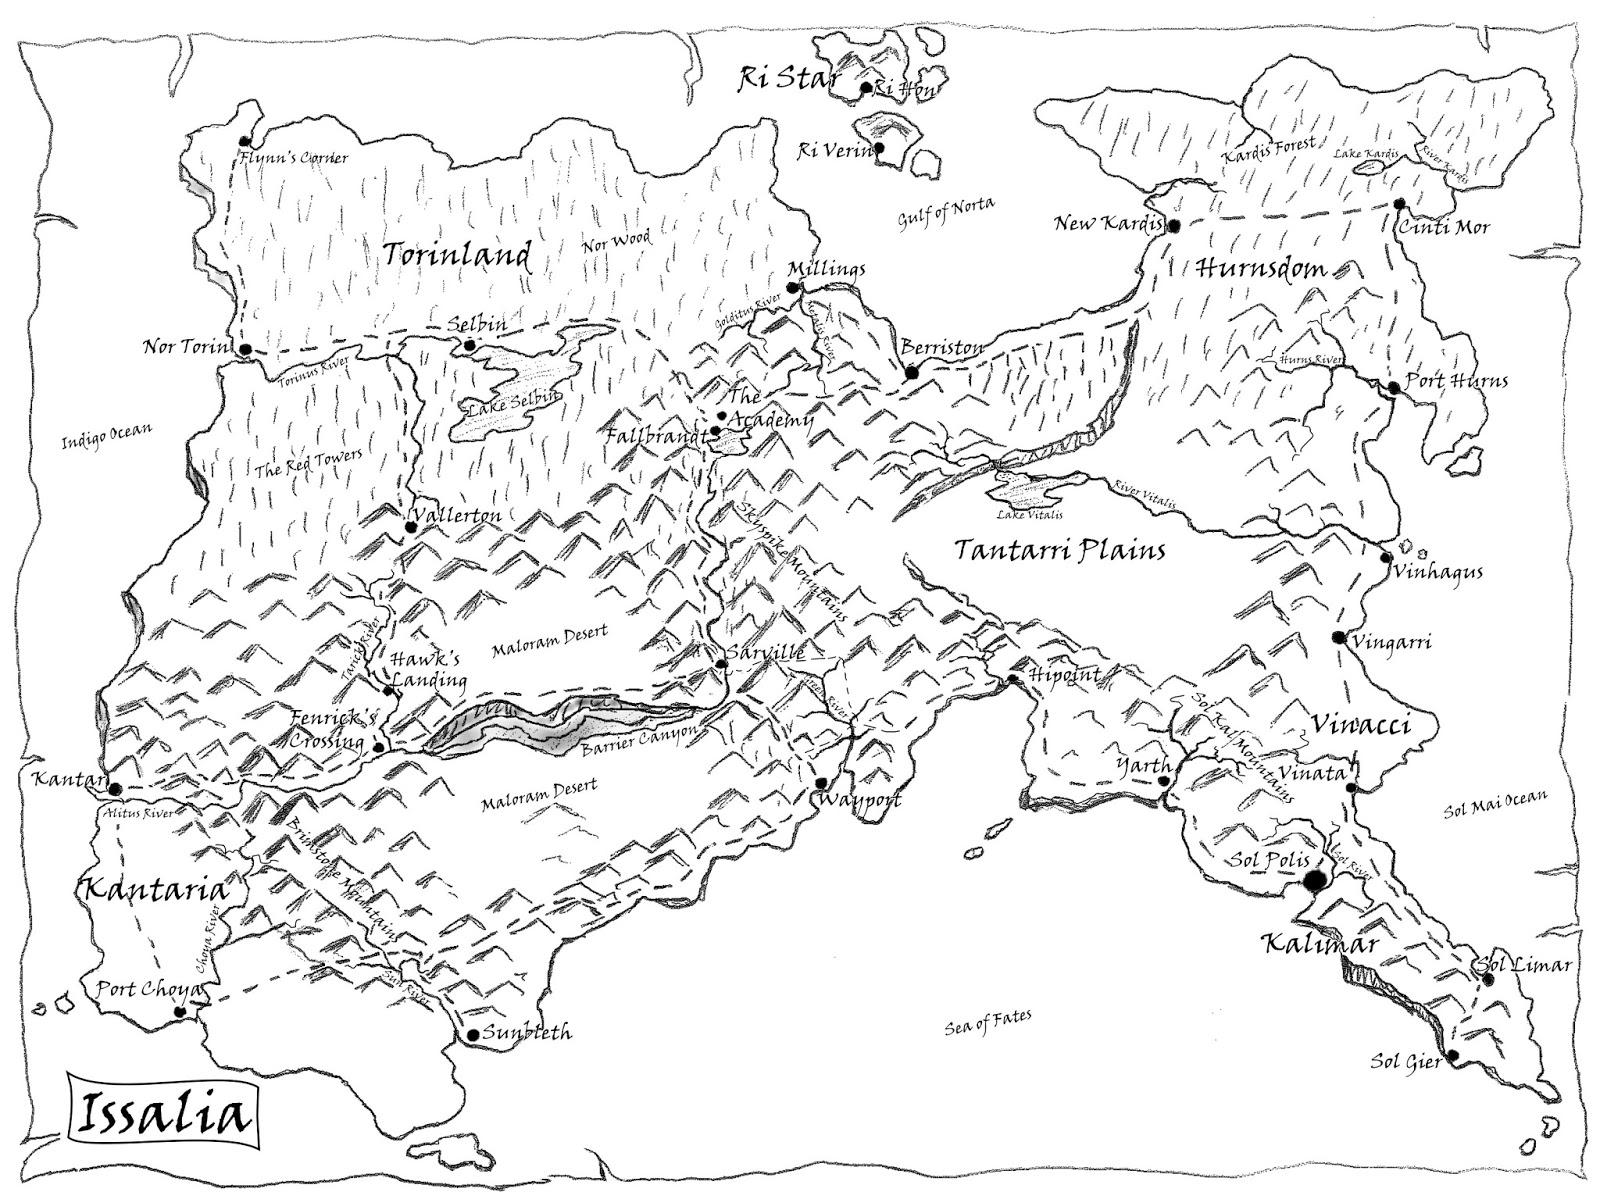 Jeffrey L Kohanek Author's Blog: Enjoy Fantasy Maps? Me Too!